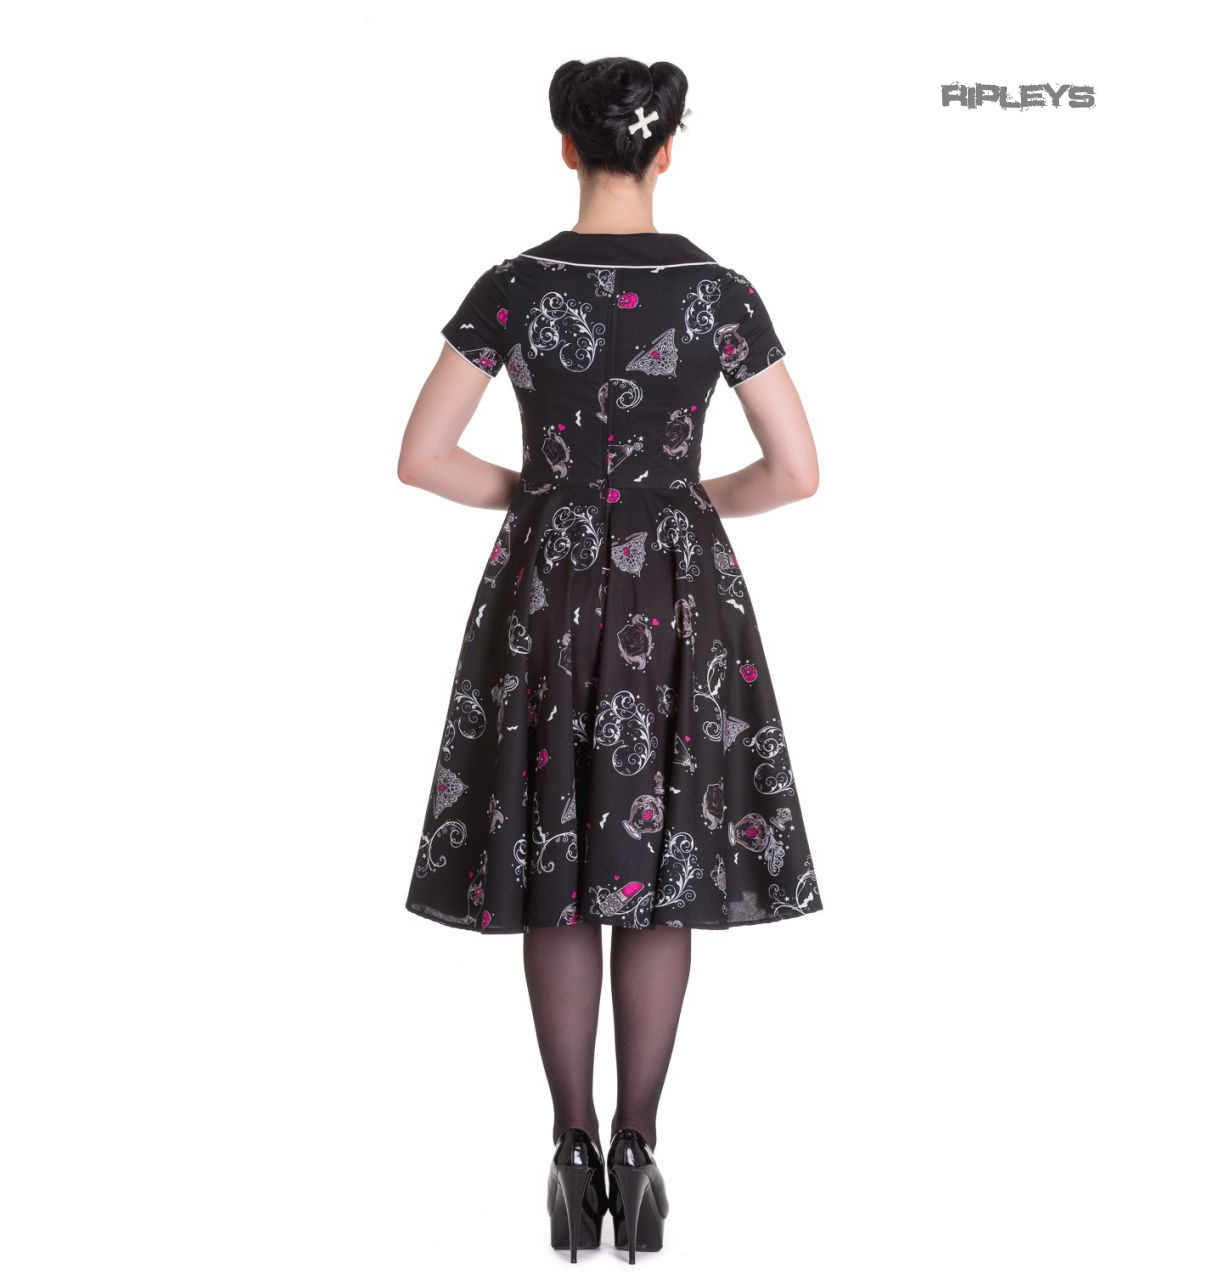 Hell-Bunny-50s-Dress-Pin-Up-Rockabilly-Black-Pink-KALONICE-Gothic-Bats-All-Sizes thumbnail 4